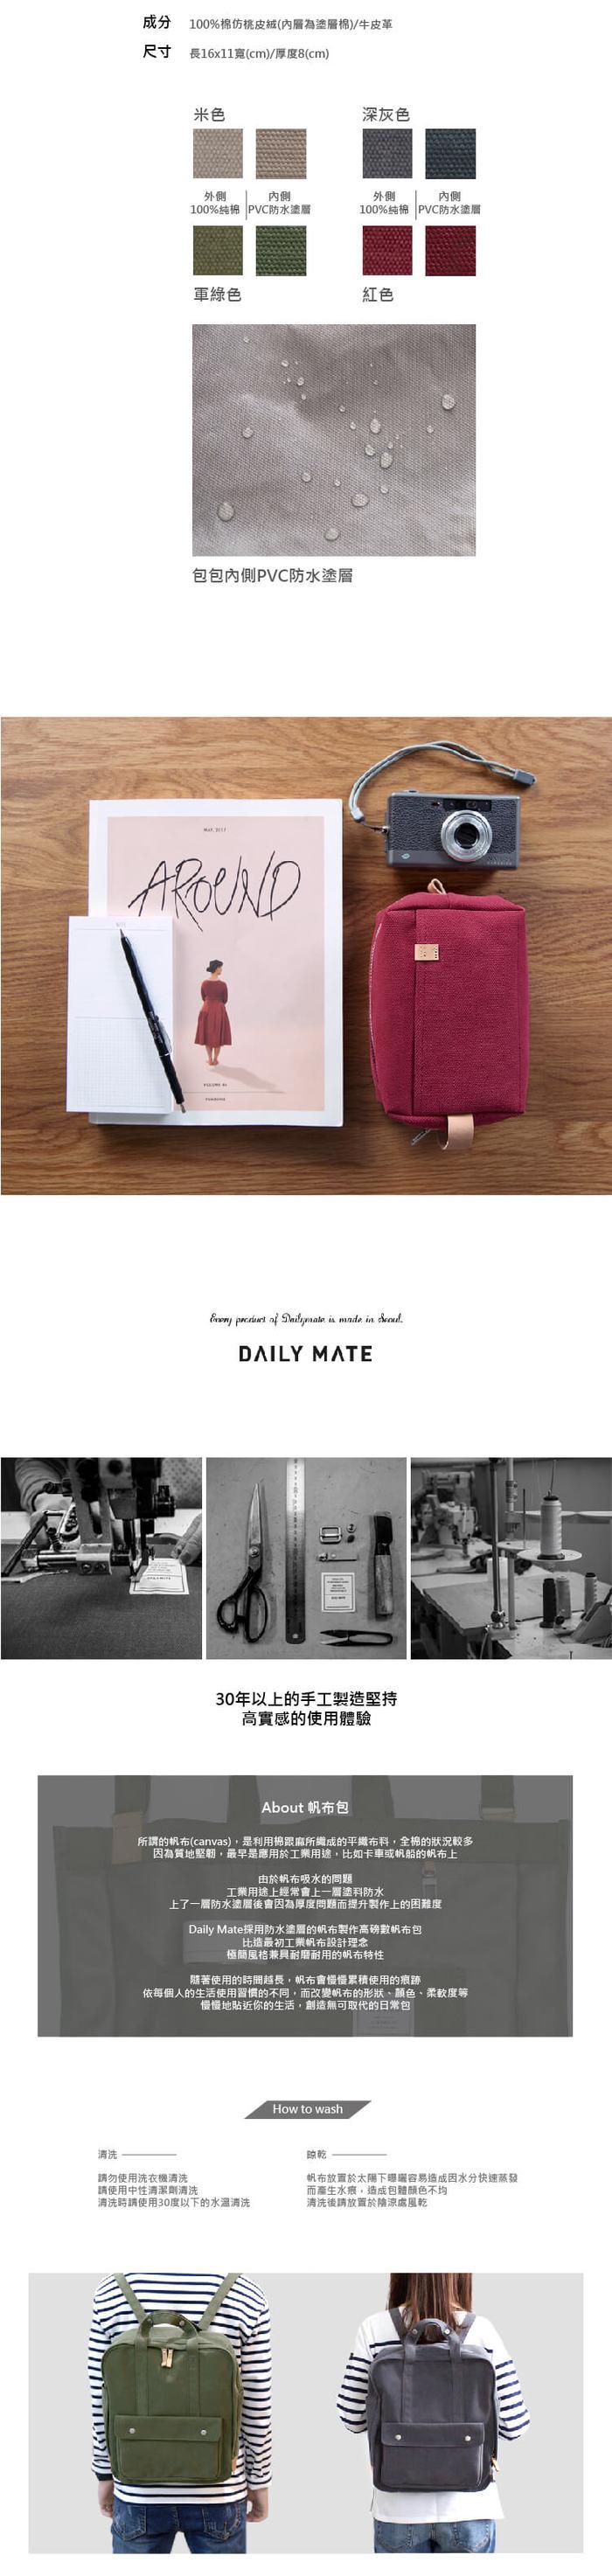 Daily mate|萬用化妝包(酒紅)